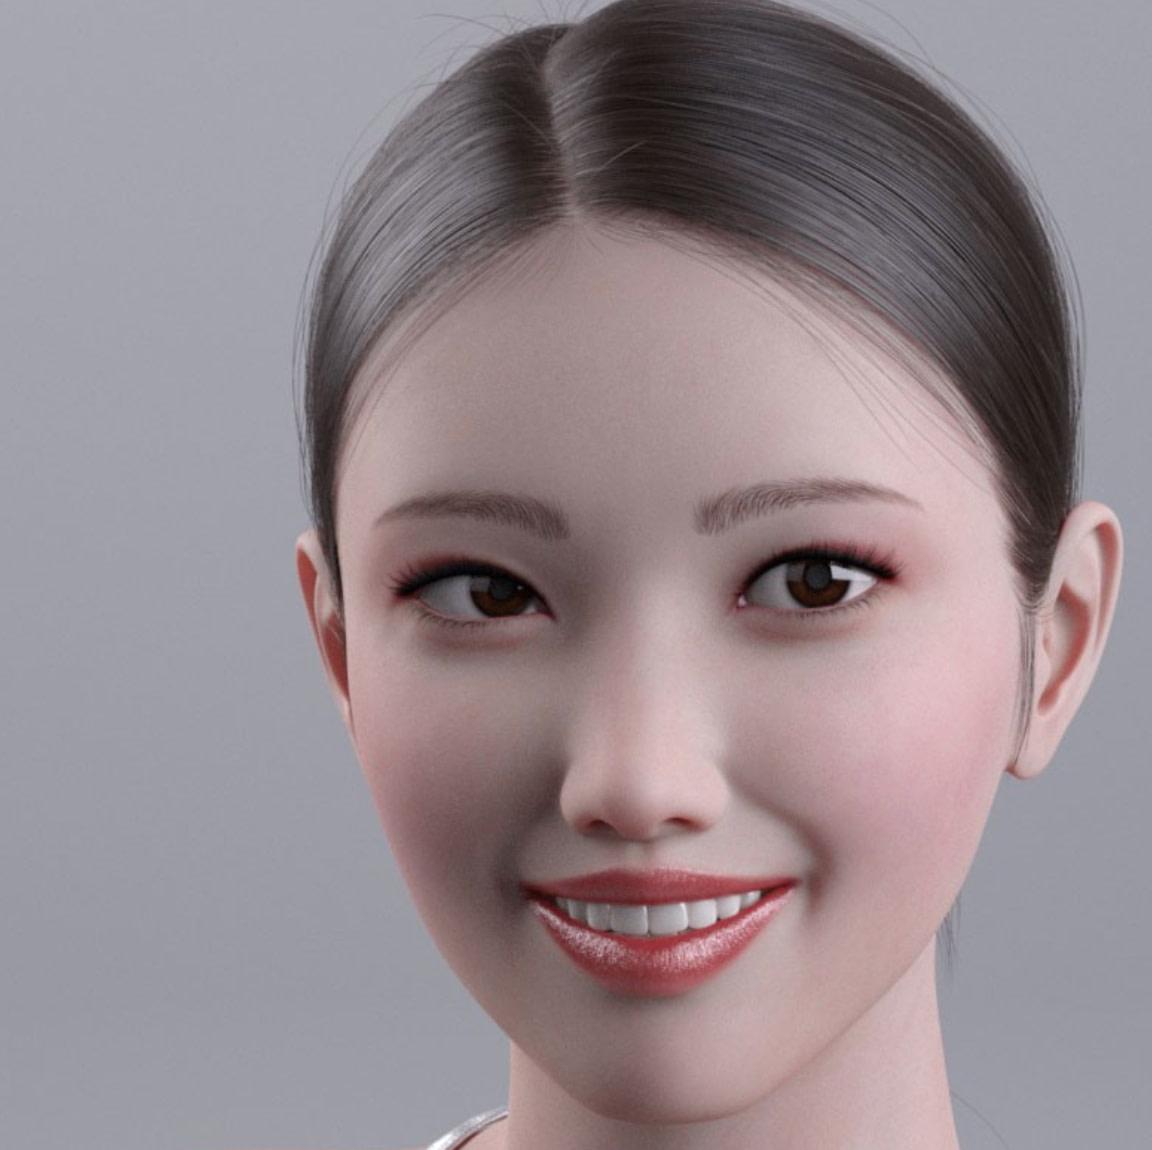 kim seohyun genesis 8 daz3d asian female